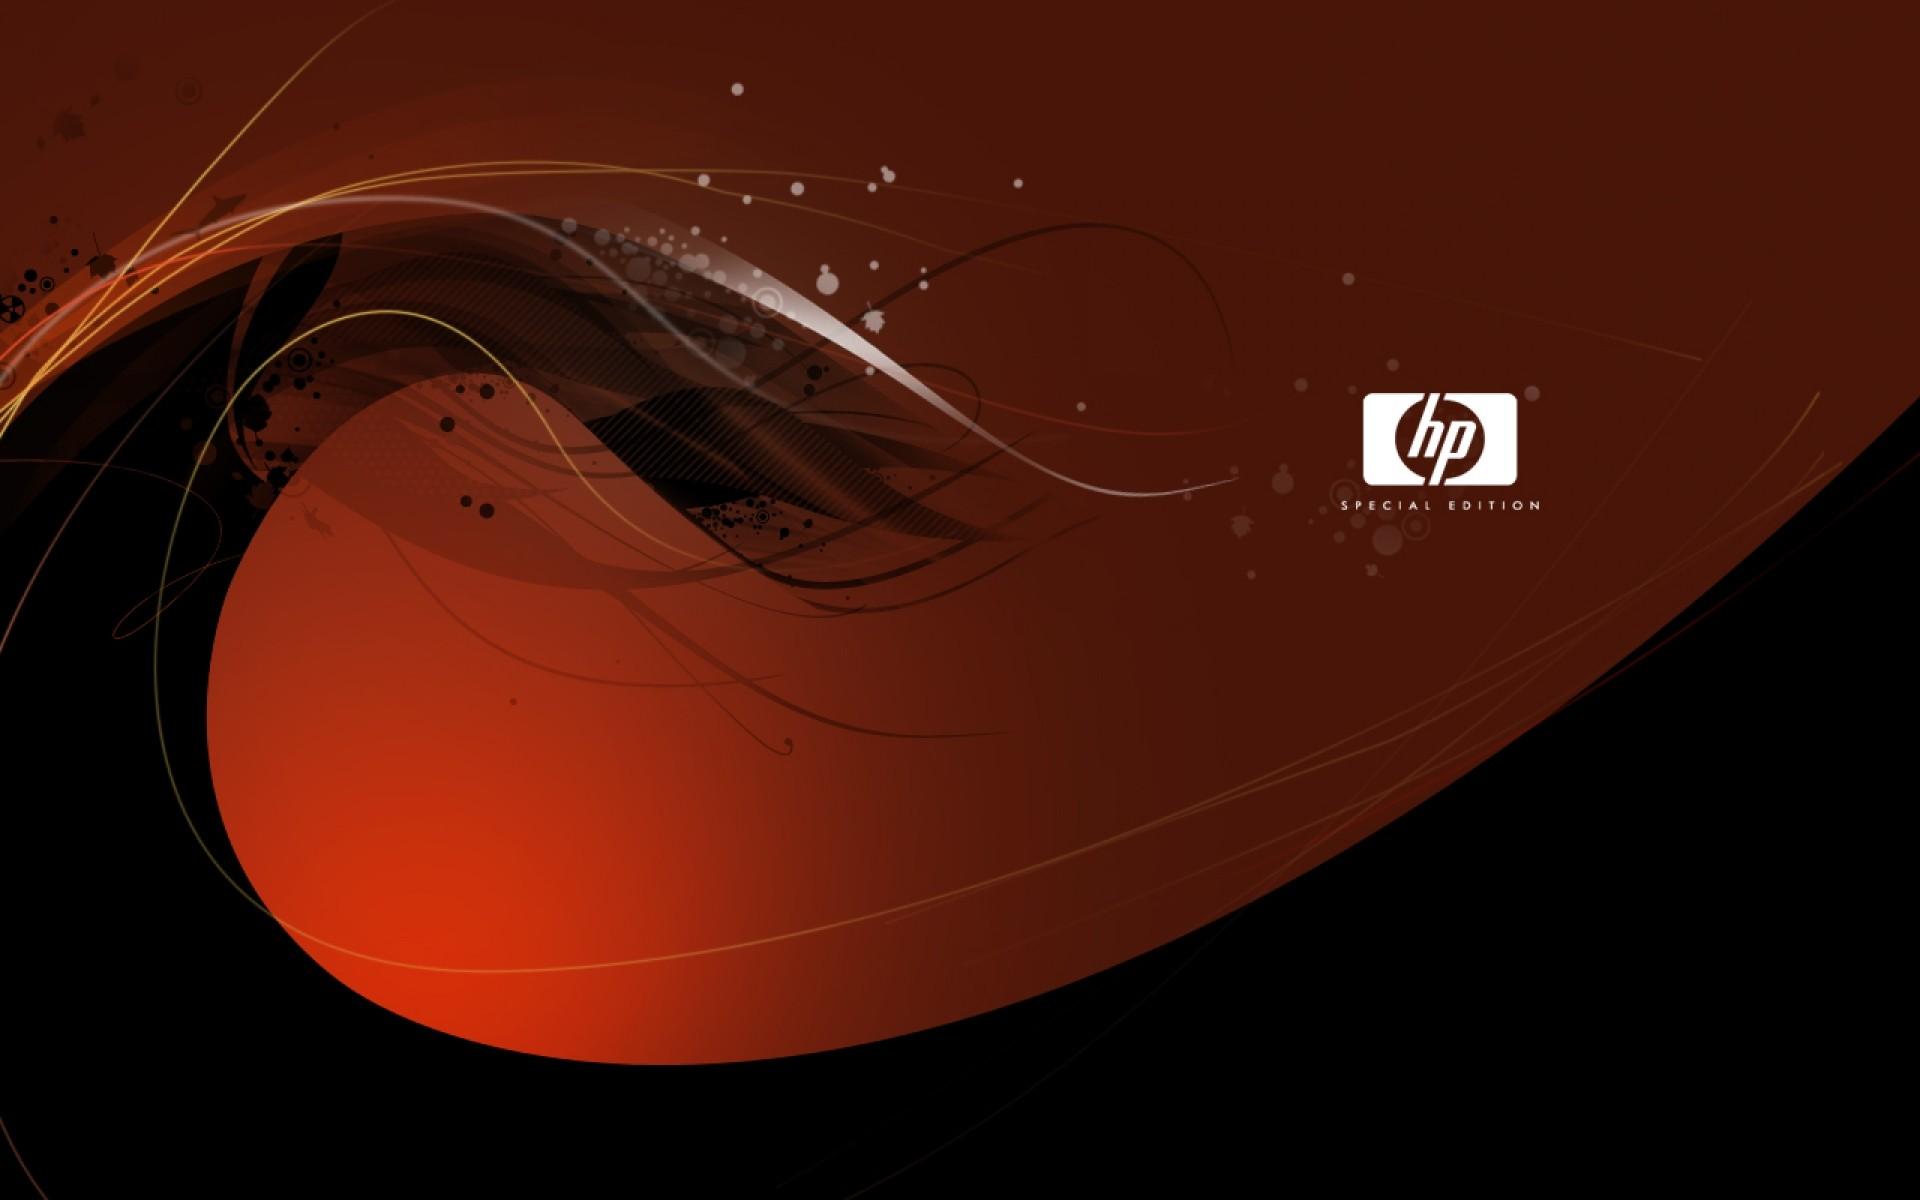 HP Desktop Wallpapers – Wallpaper Cave